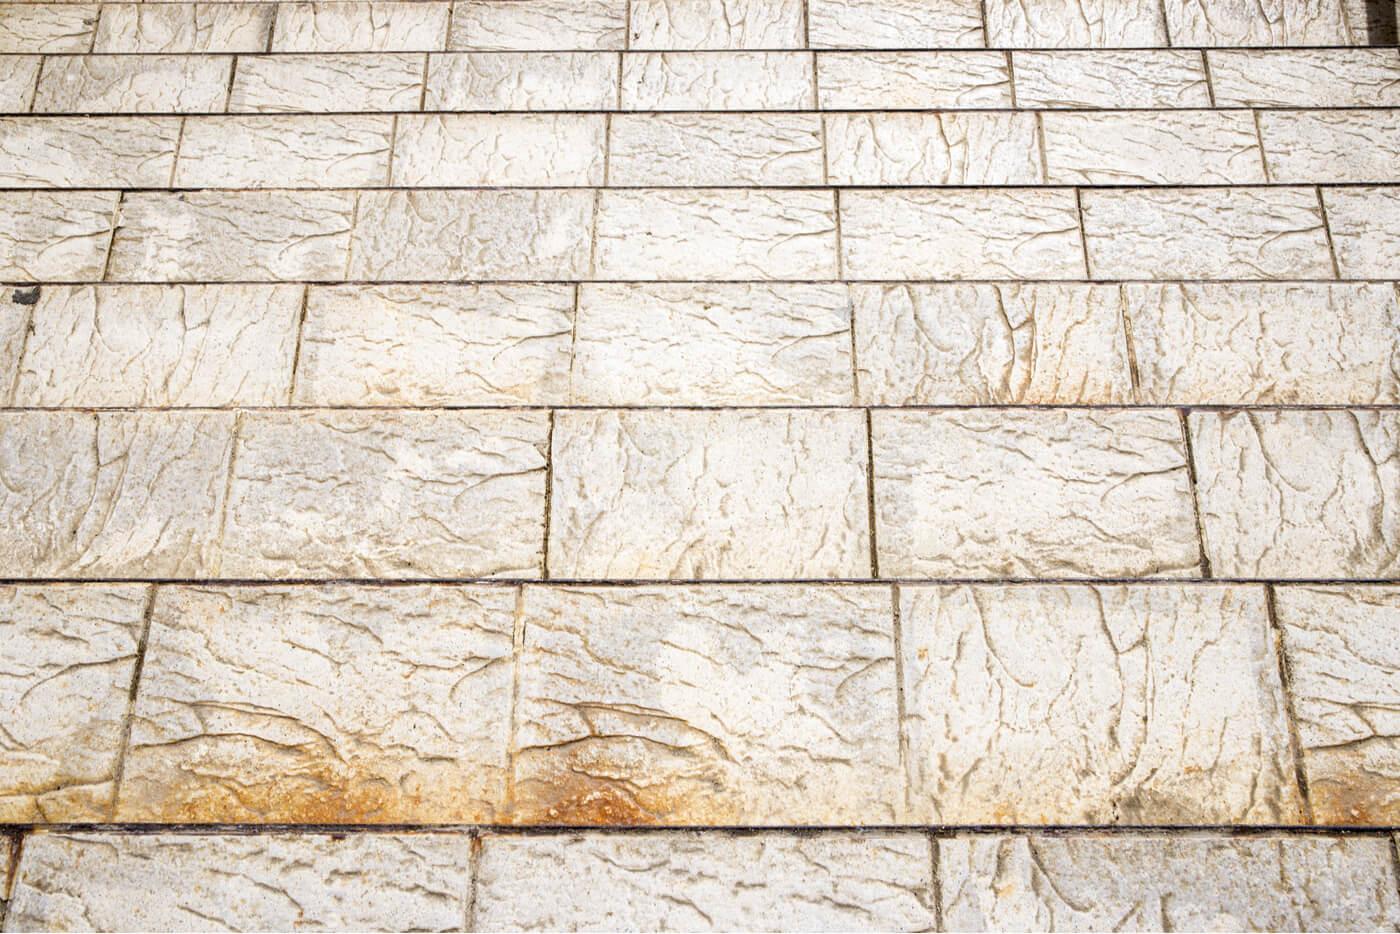 Rough ceramic for rustic-style floors